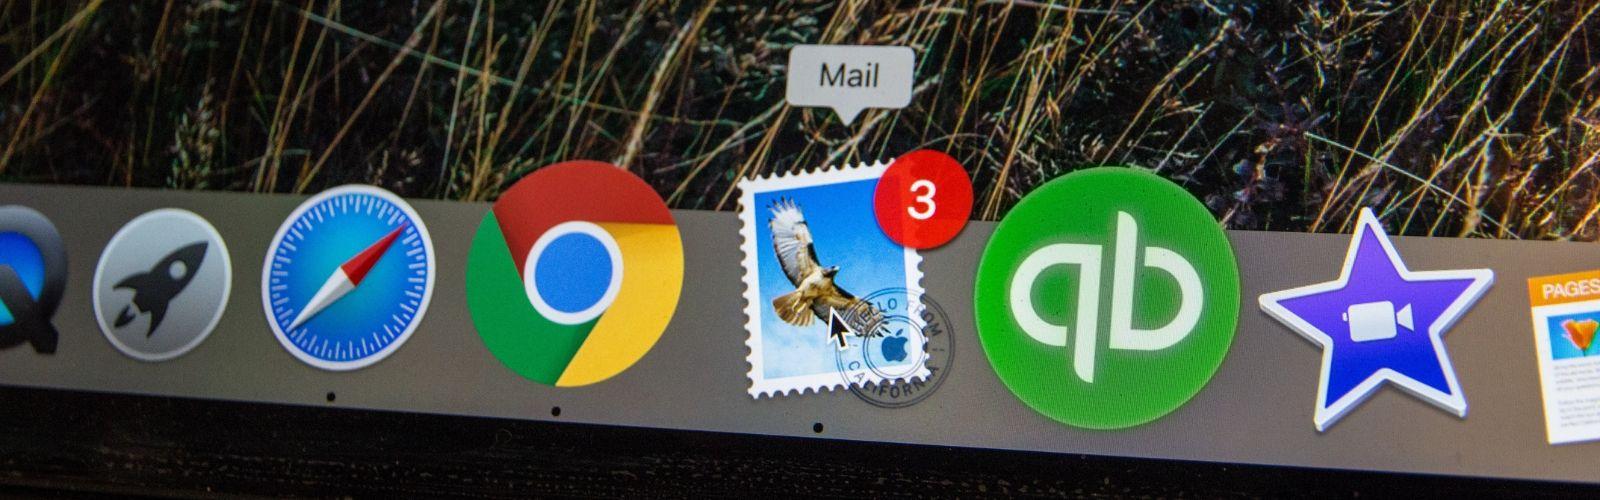 iMac bottom menu bar focused on mail program